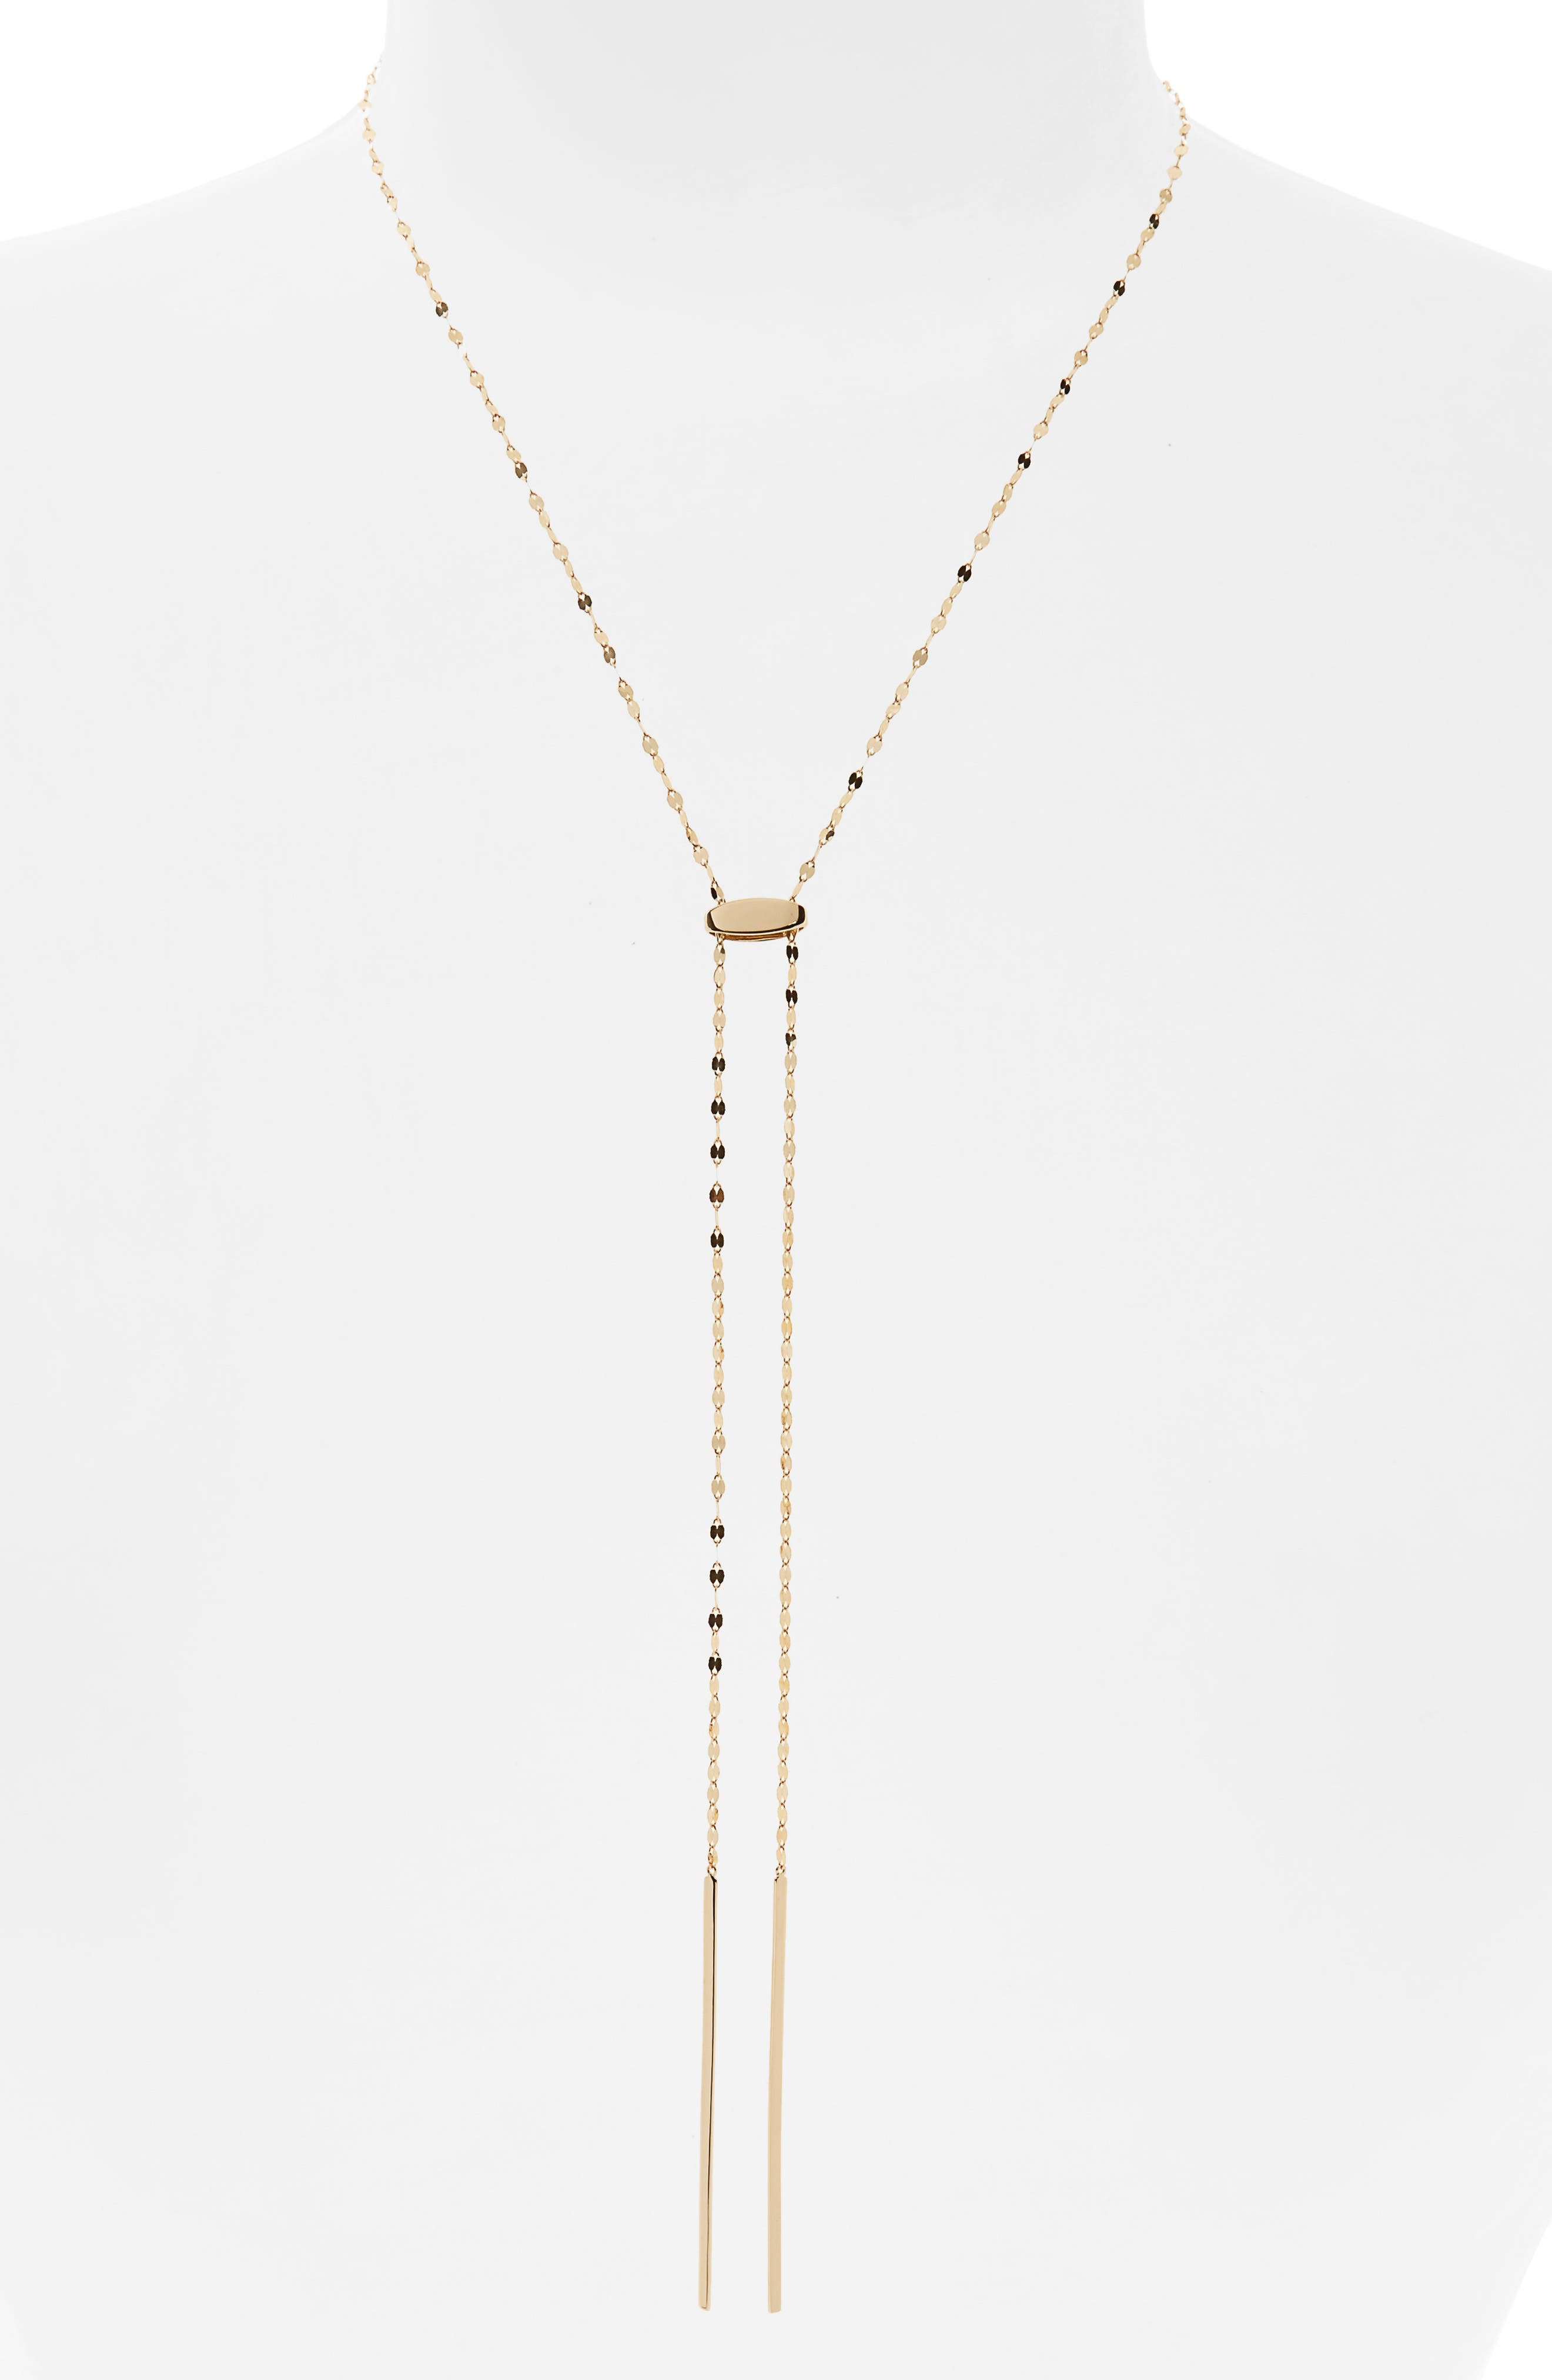 Lana Jewelry Blake Tie Up Lariat Necklace